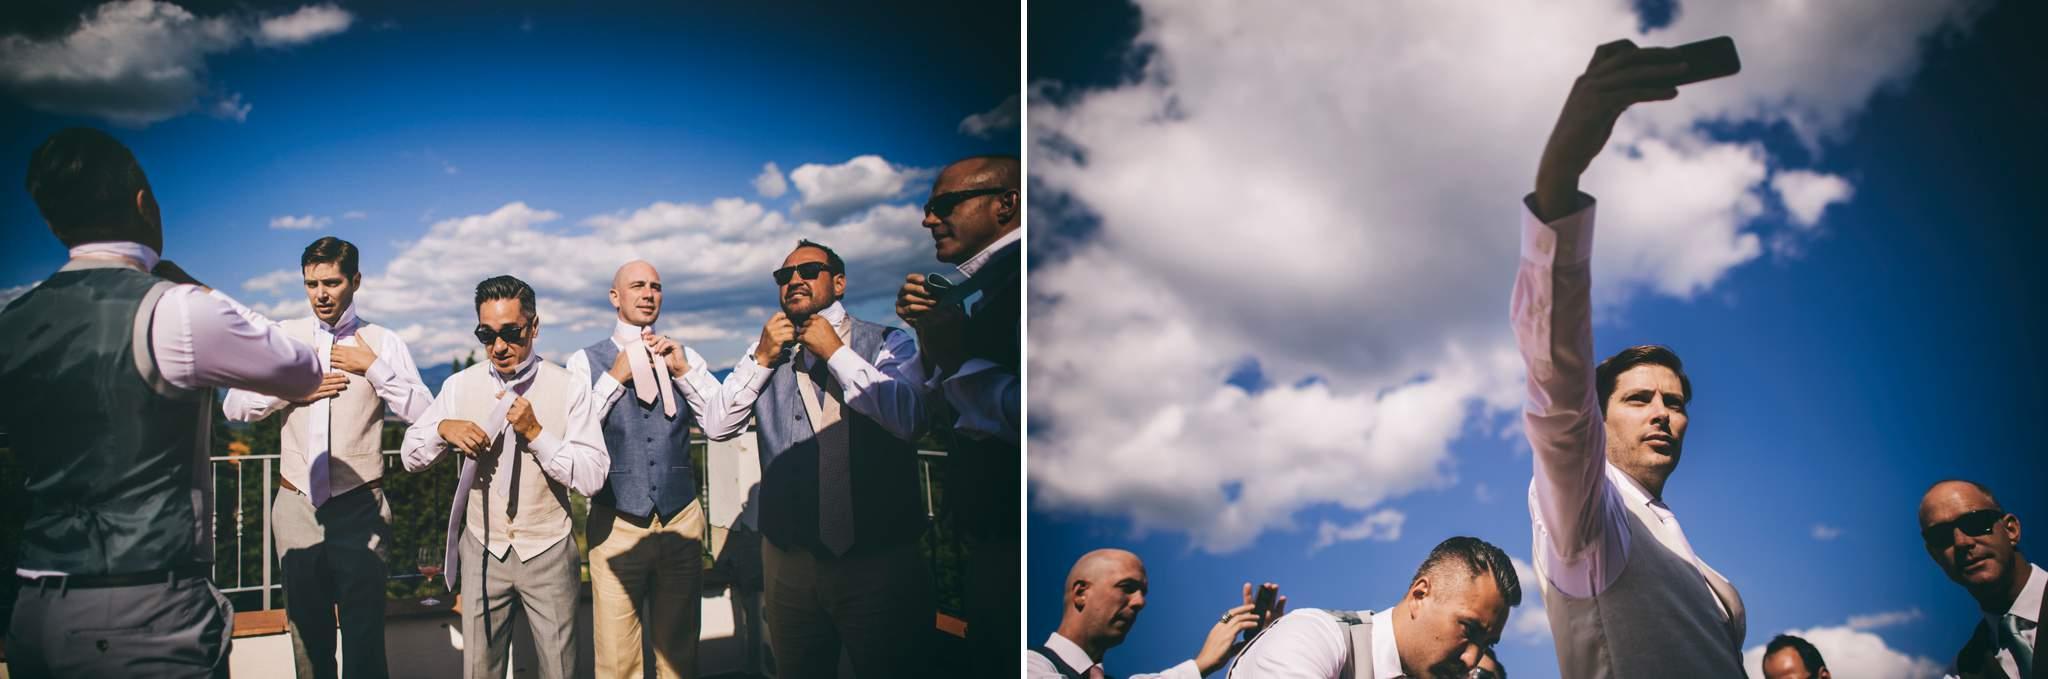 11fotografo-matrimonio-toscana-villa-teresa